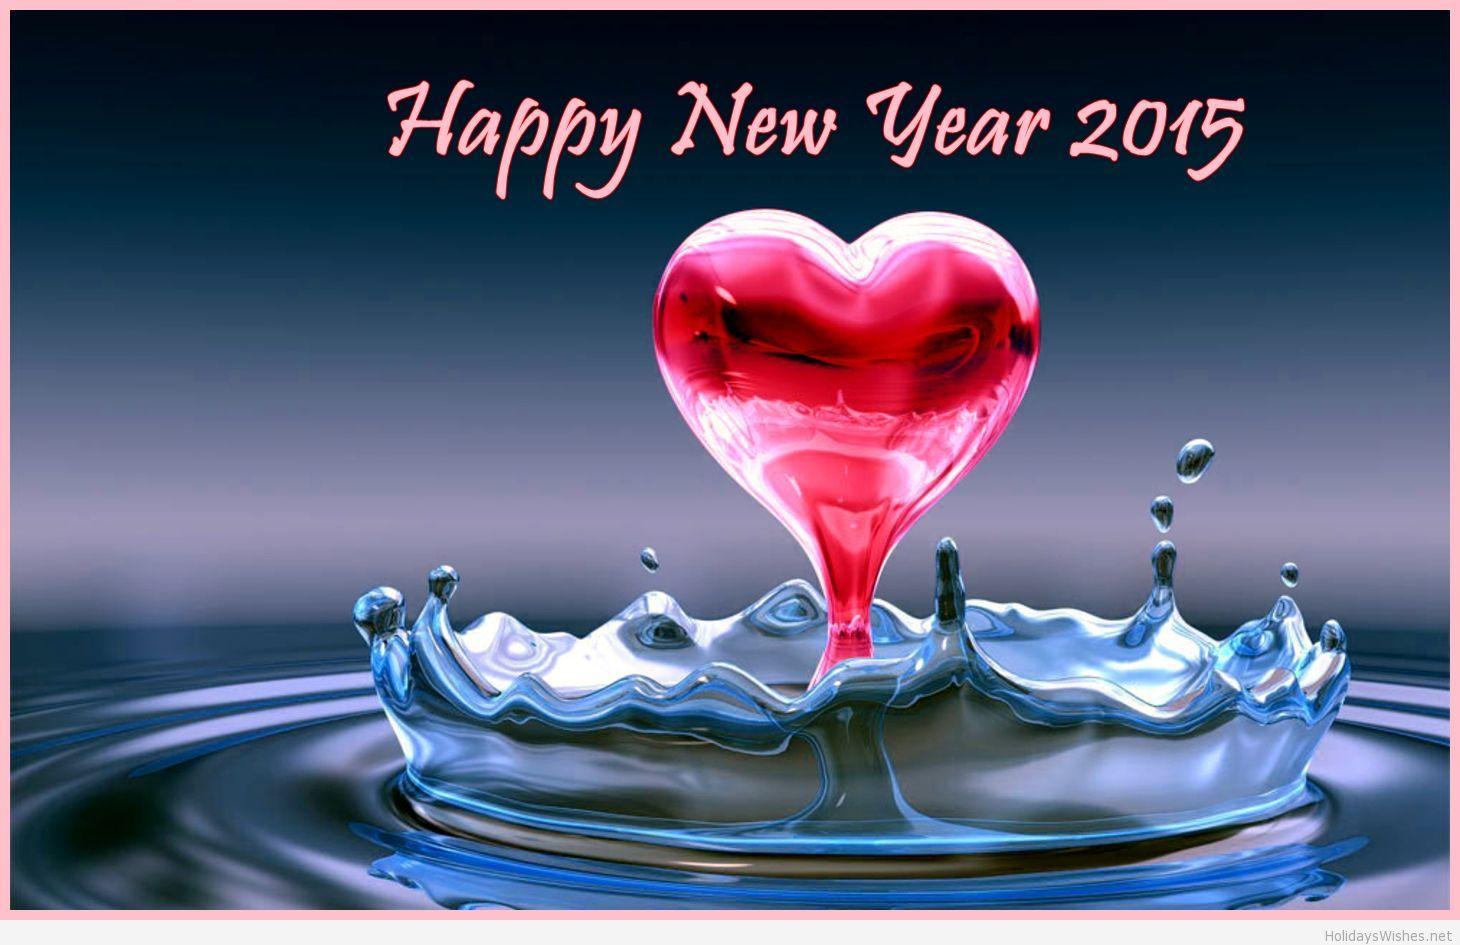 D Happy New Year wallpaper 1460x945